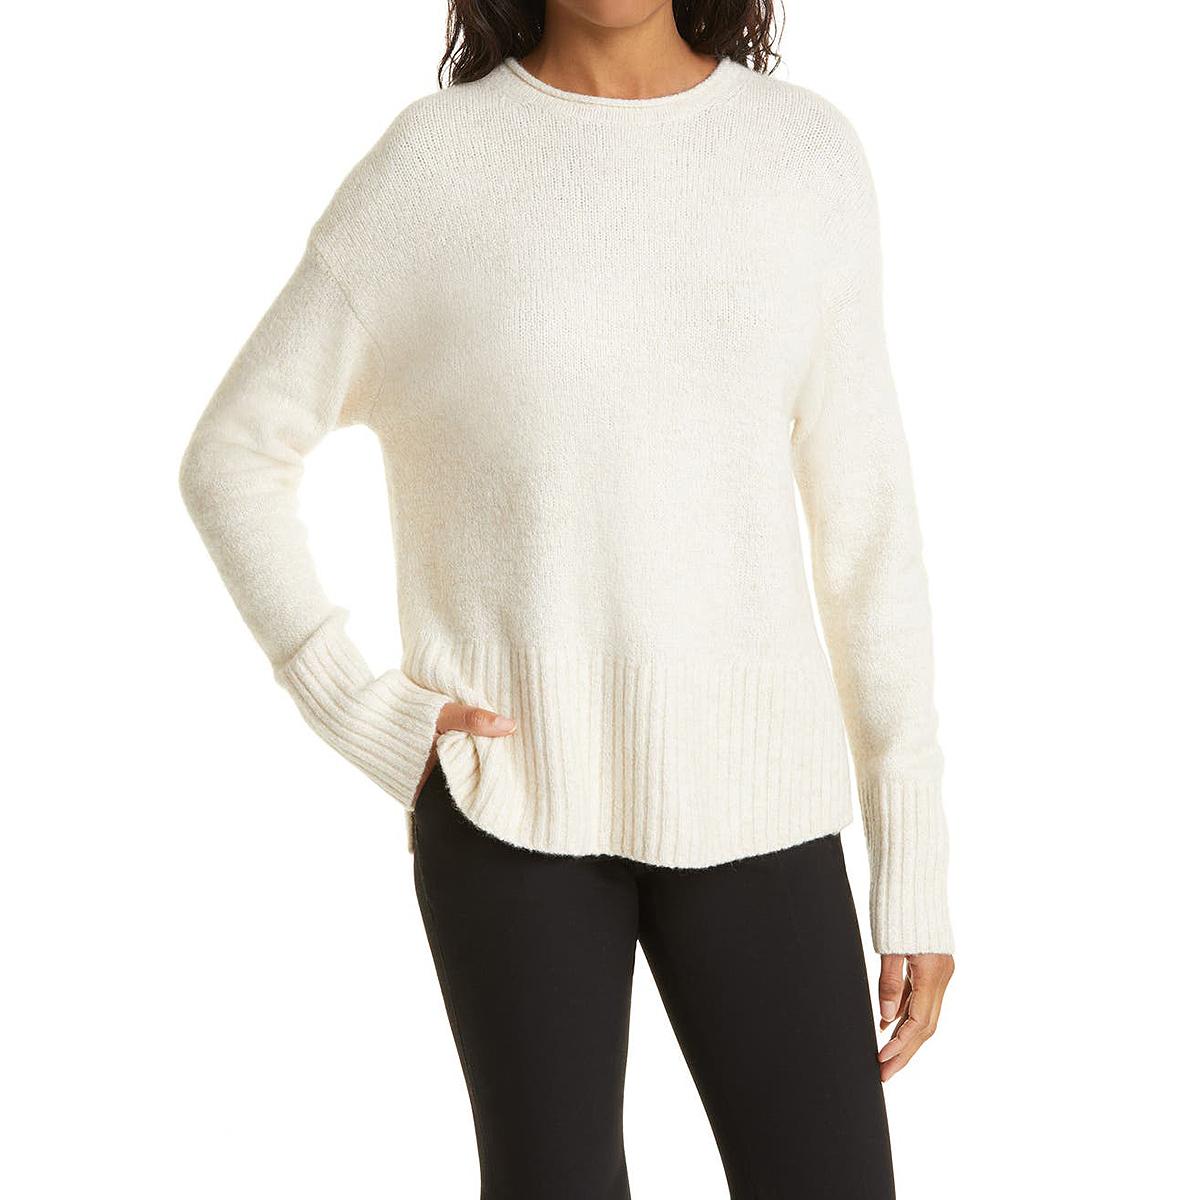 nordstrom-sale-sweater